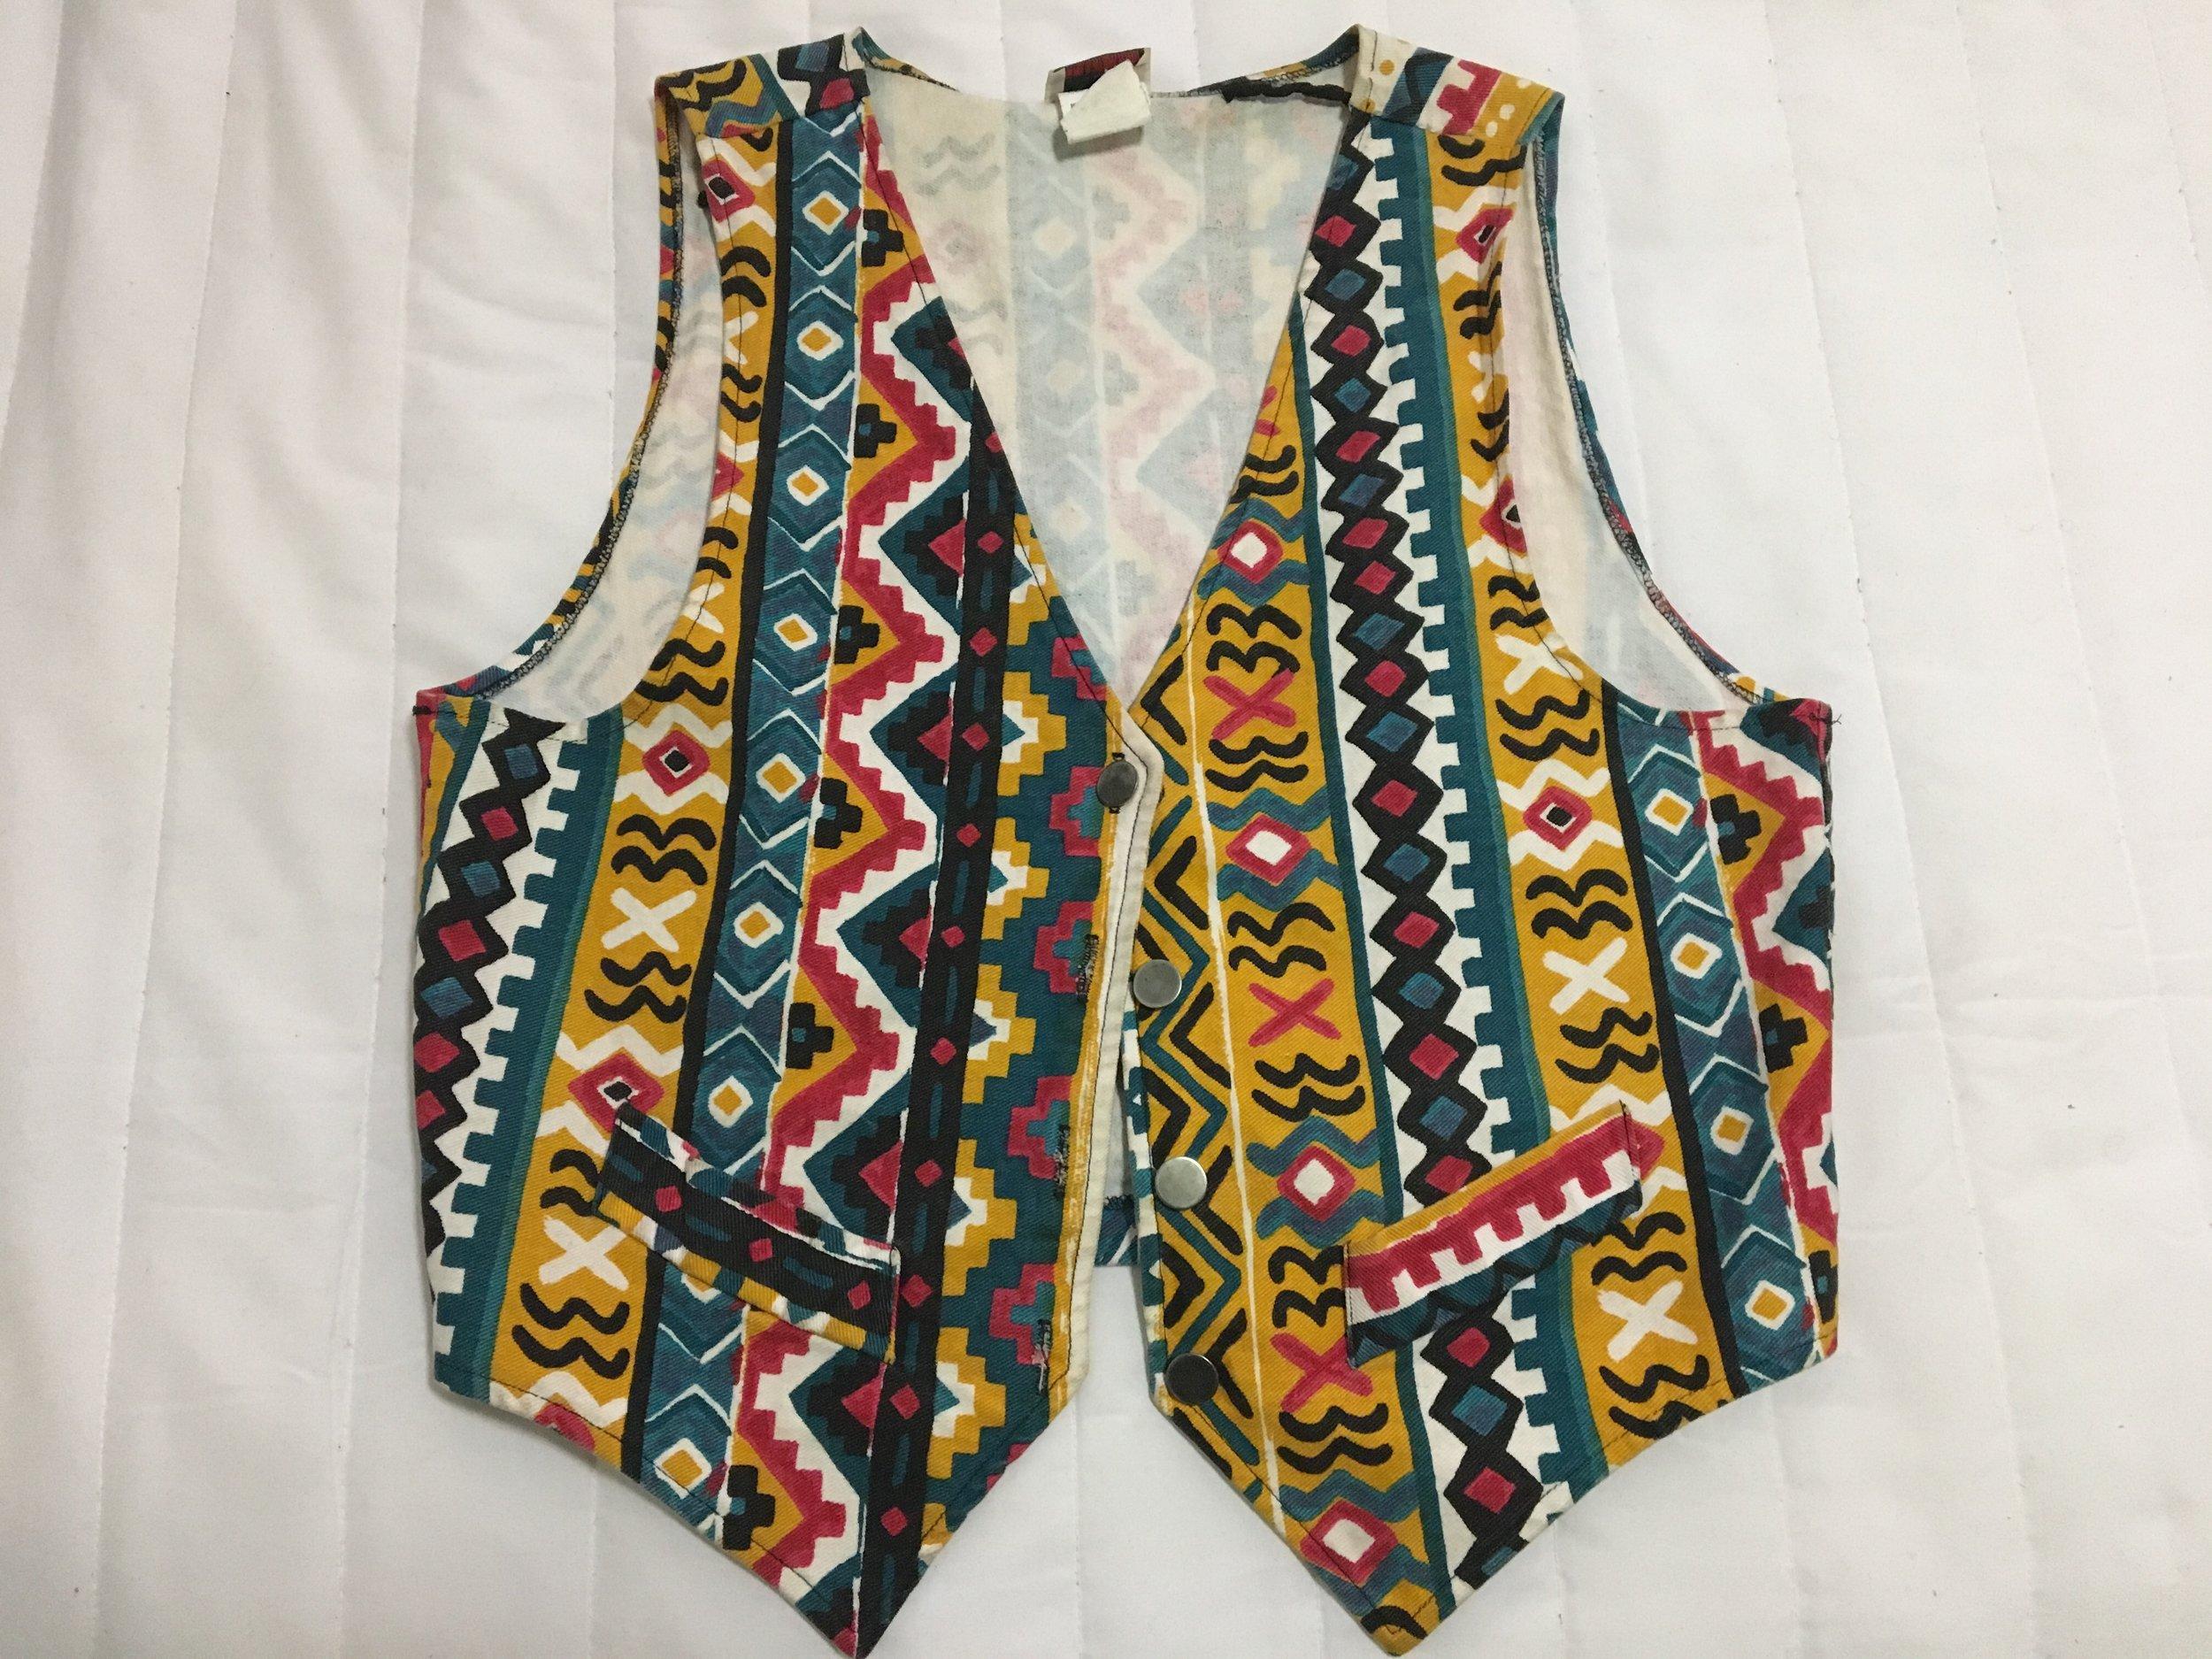 My 'Martin' vest from Etsy.com